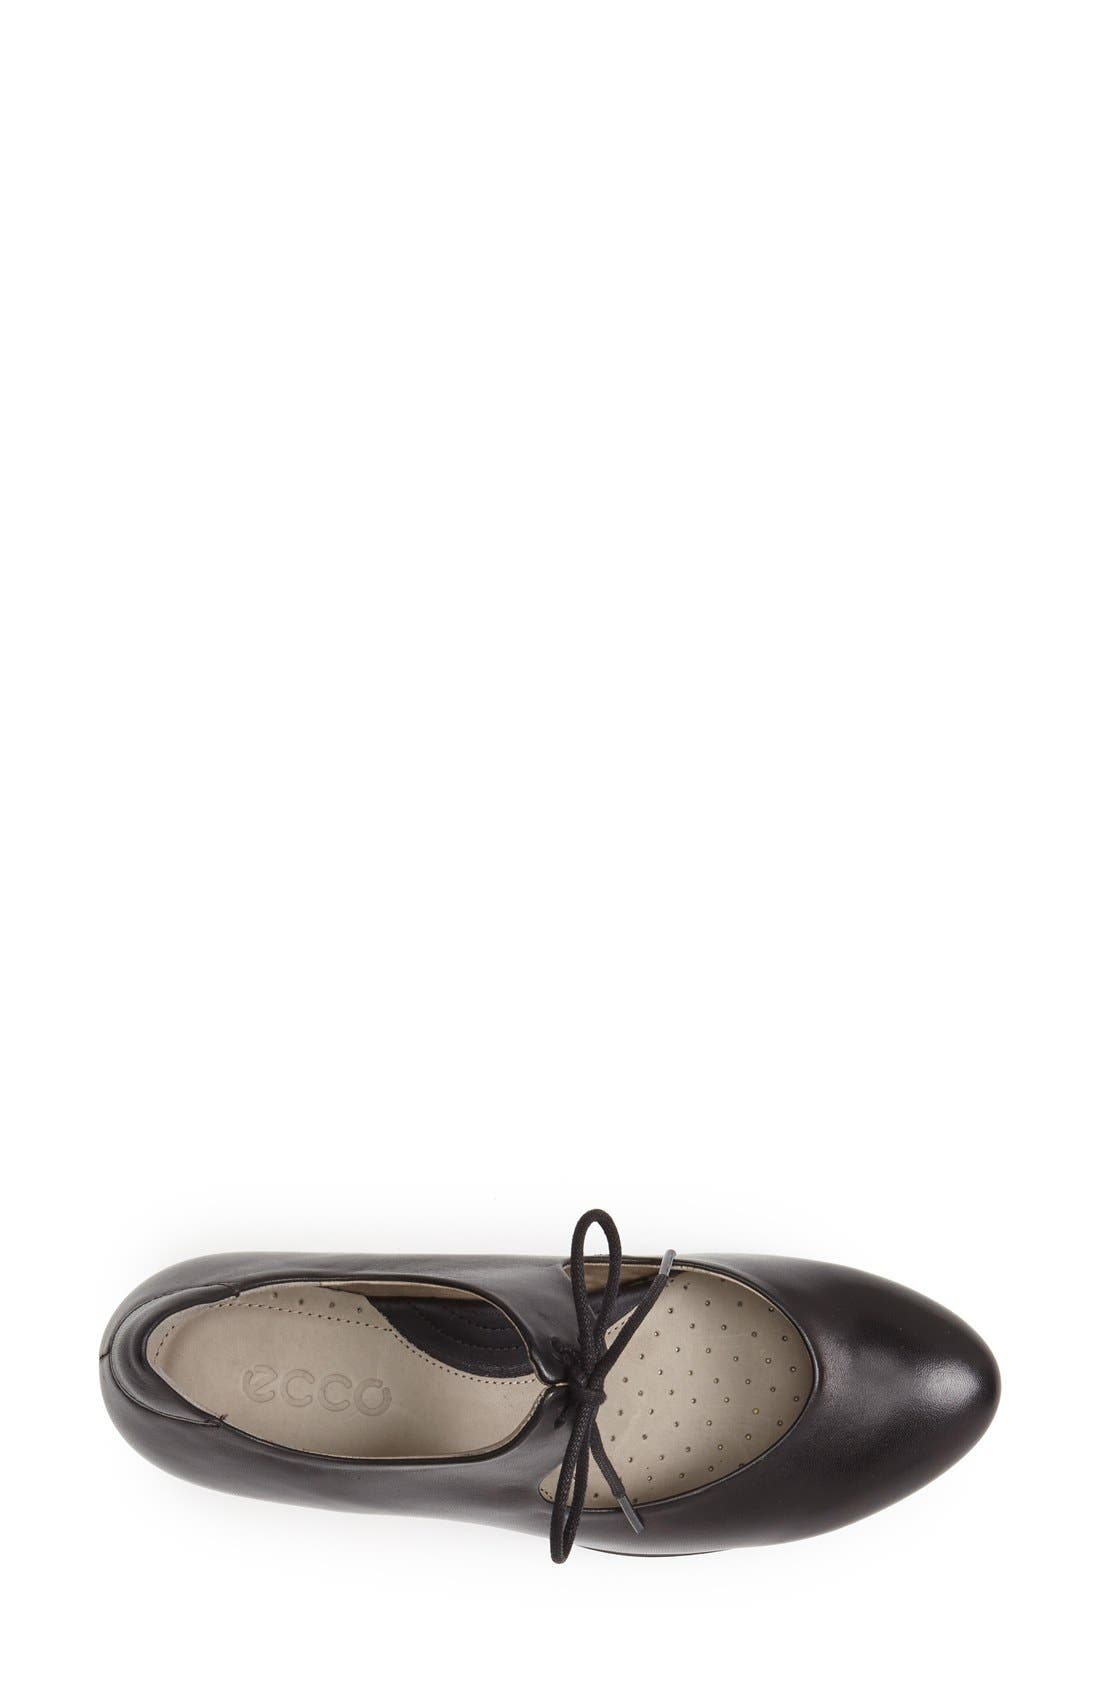 Alternate Image 3  - ECCO 'Sculptured 45' Leather Mary Jane Wedge Pump (Women)